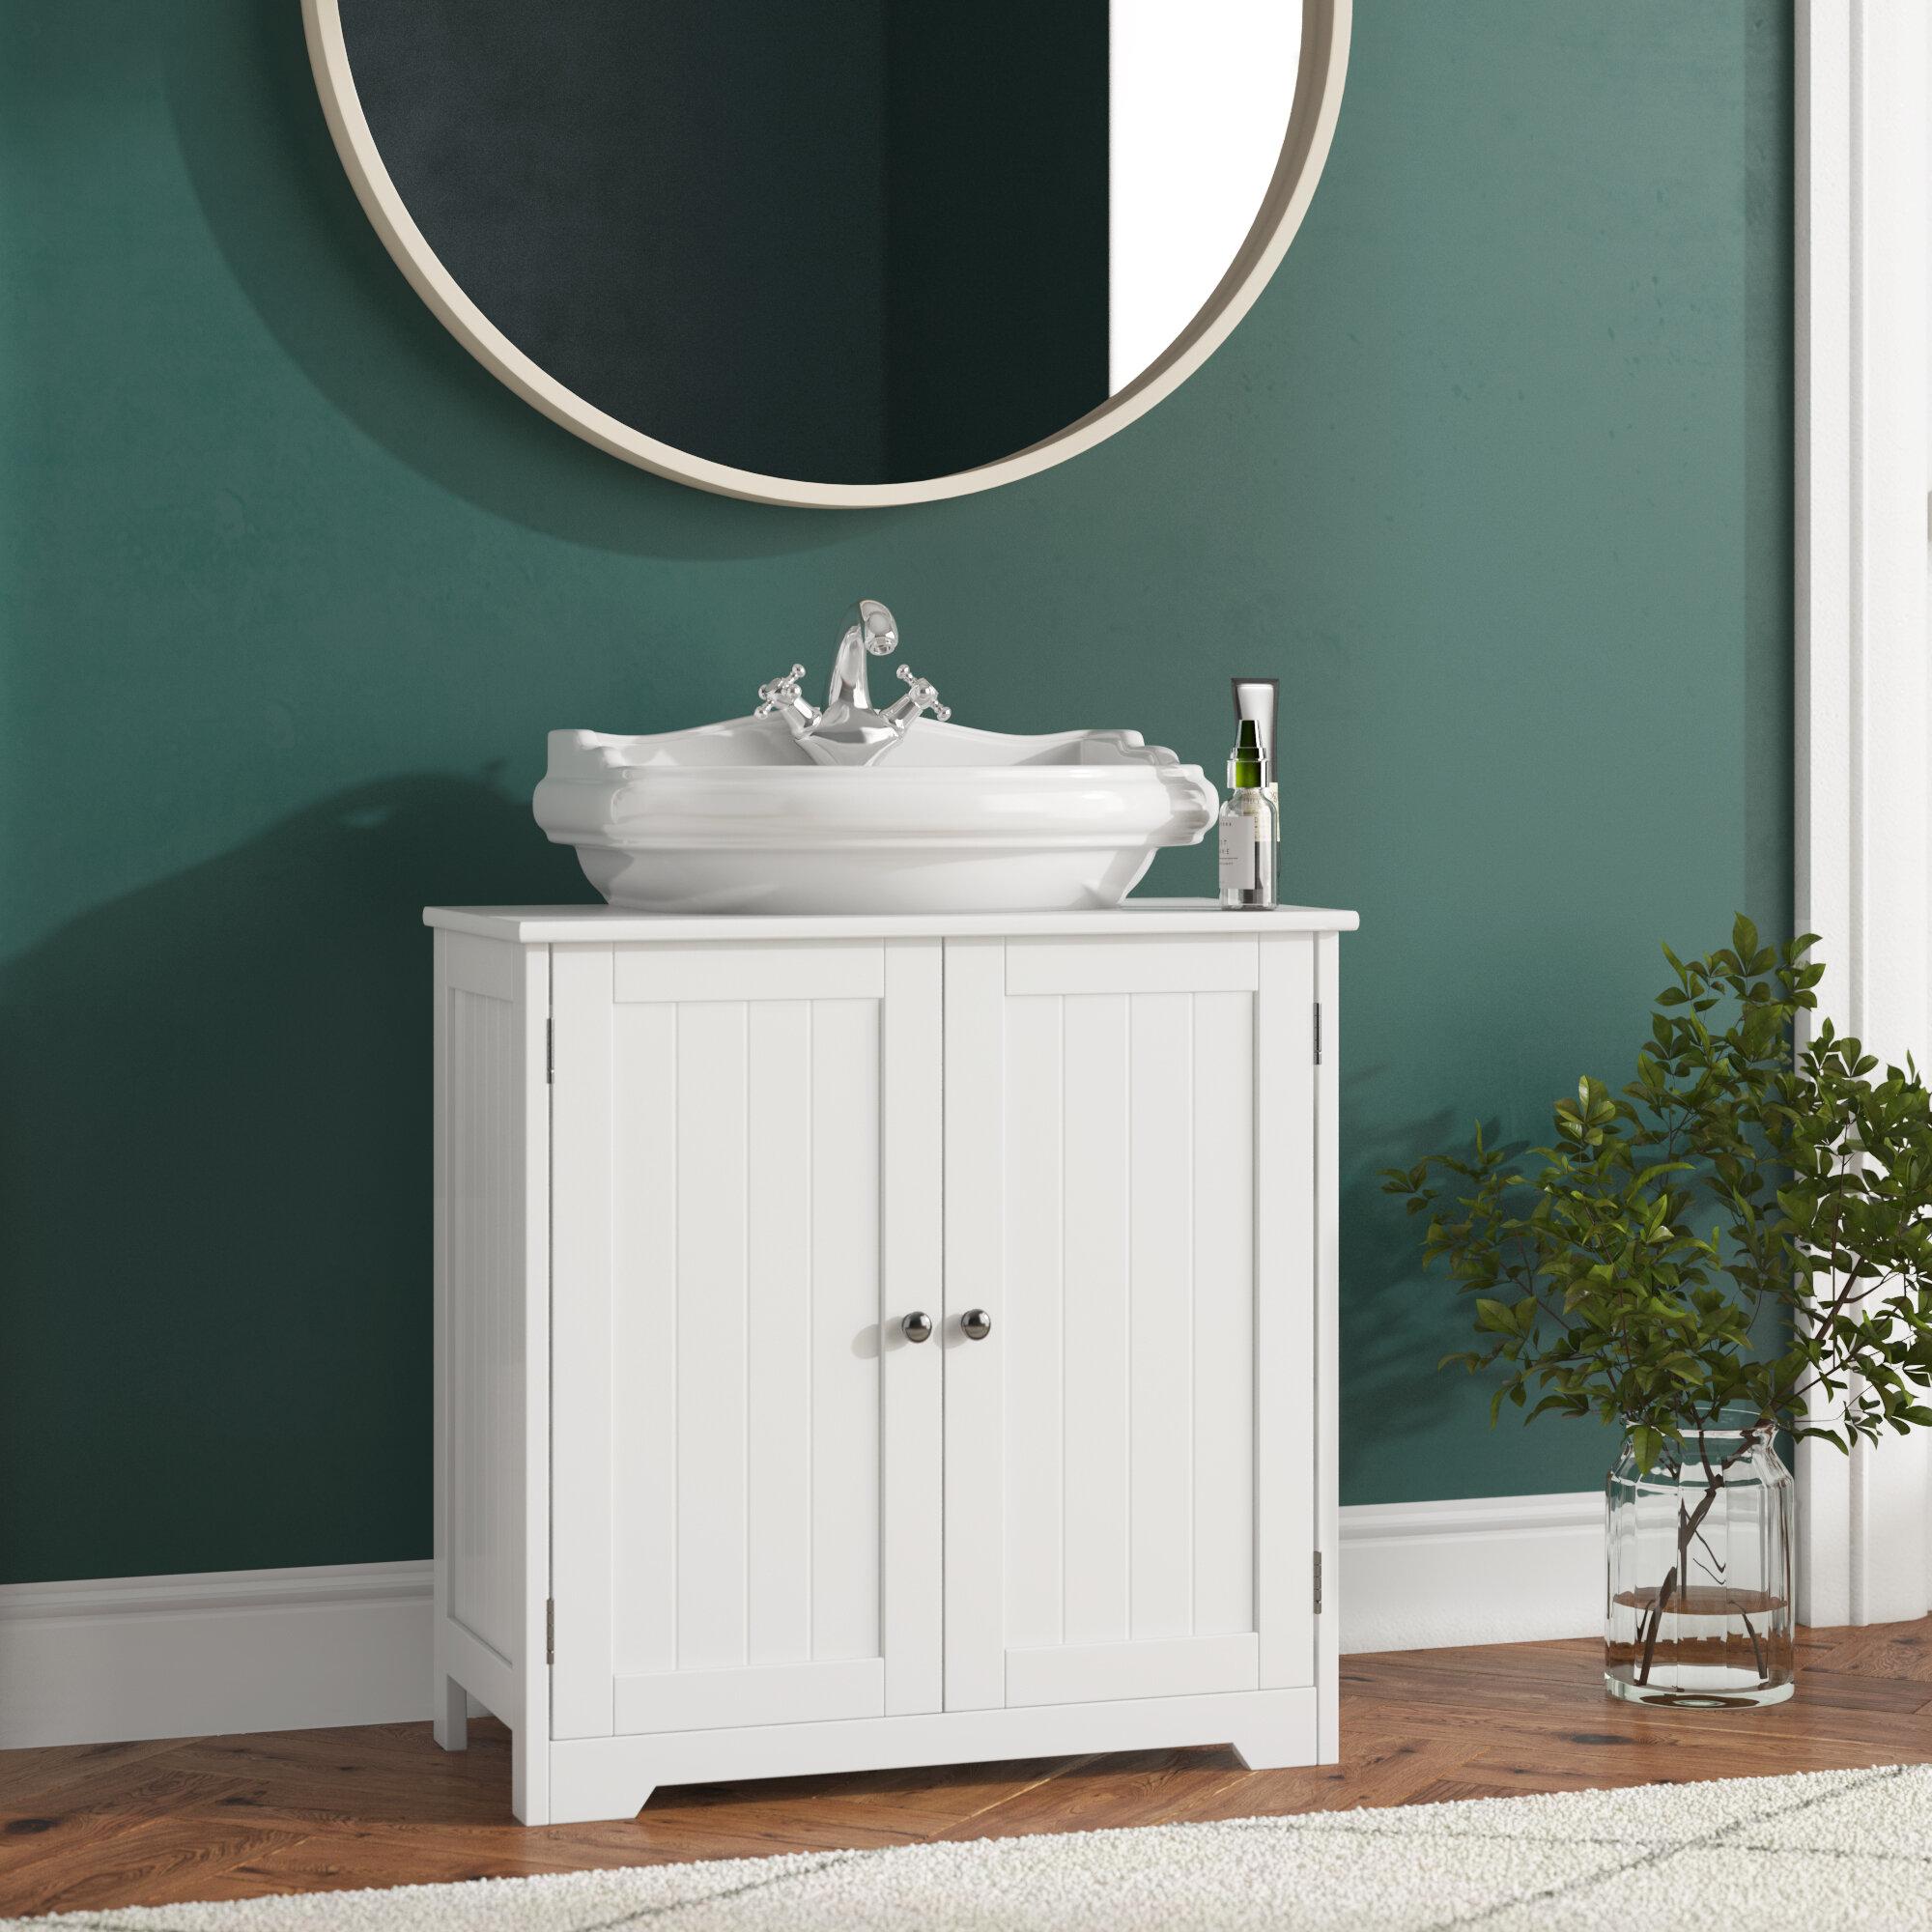 Wildon home vida priano 60cm under sink storage unit reviews wayfair co uk